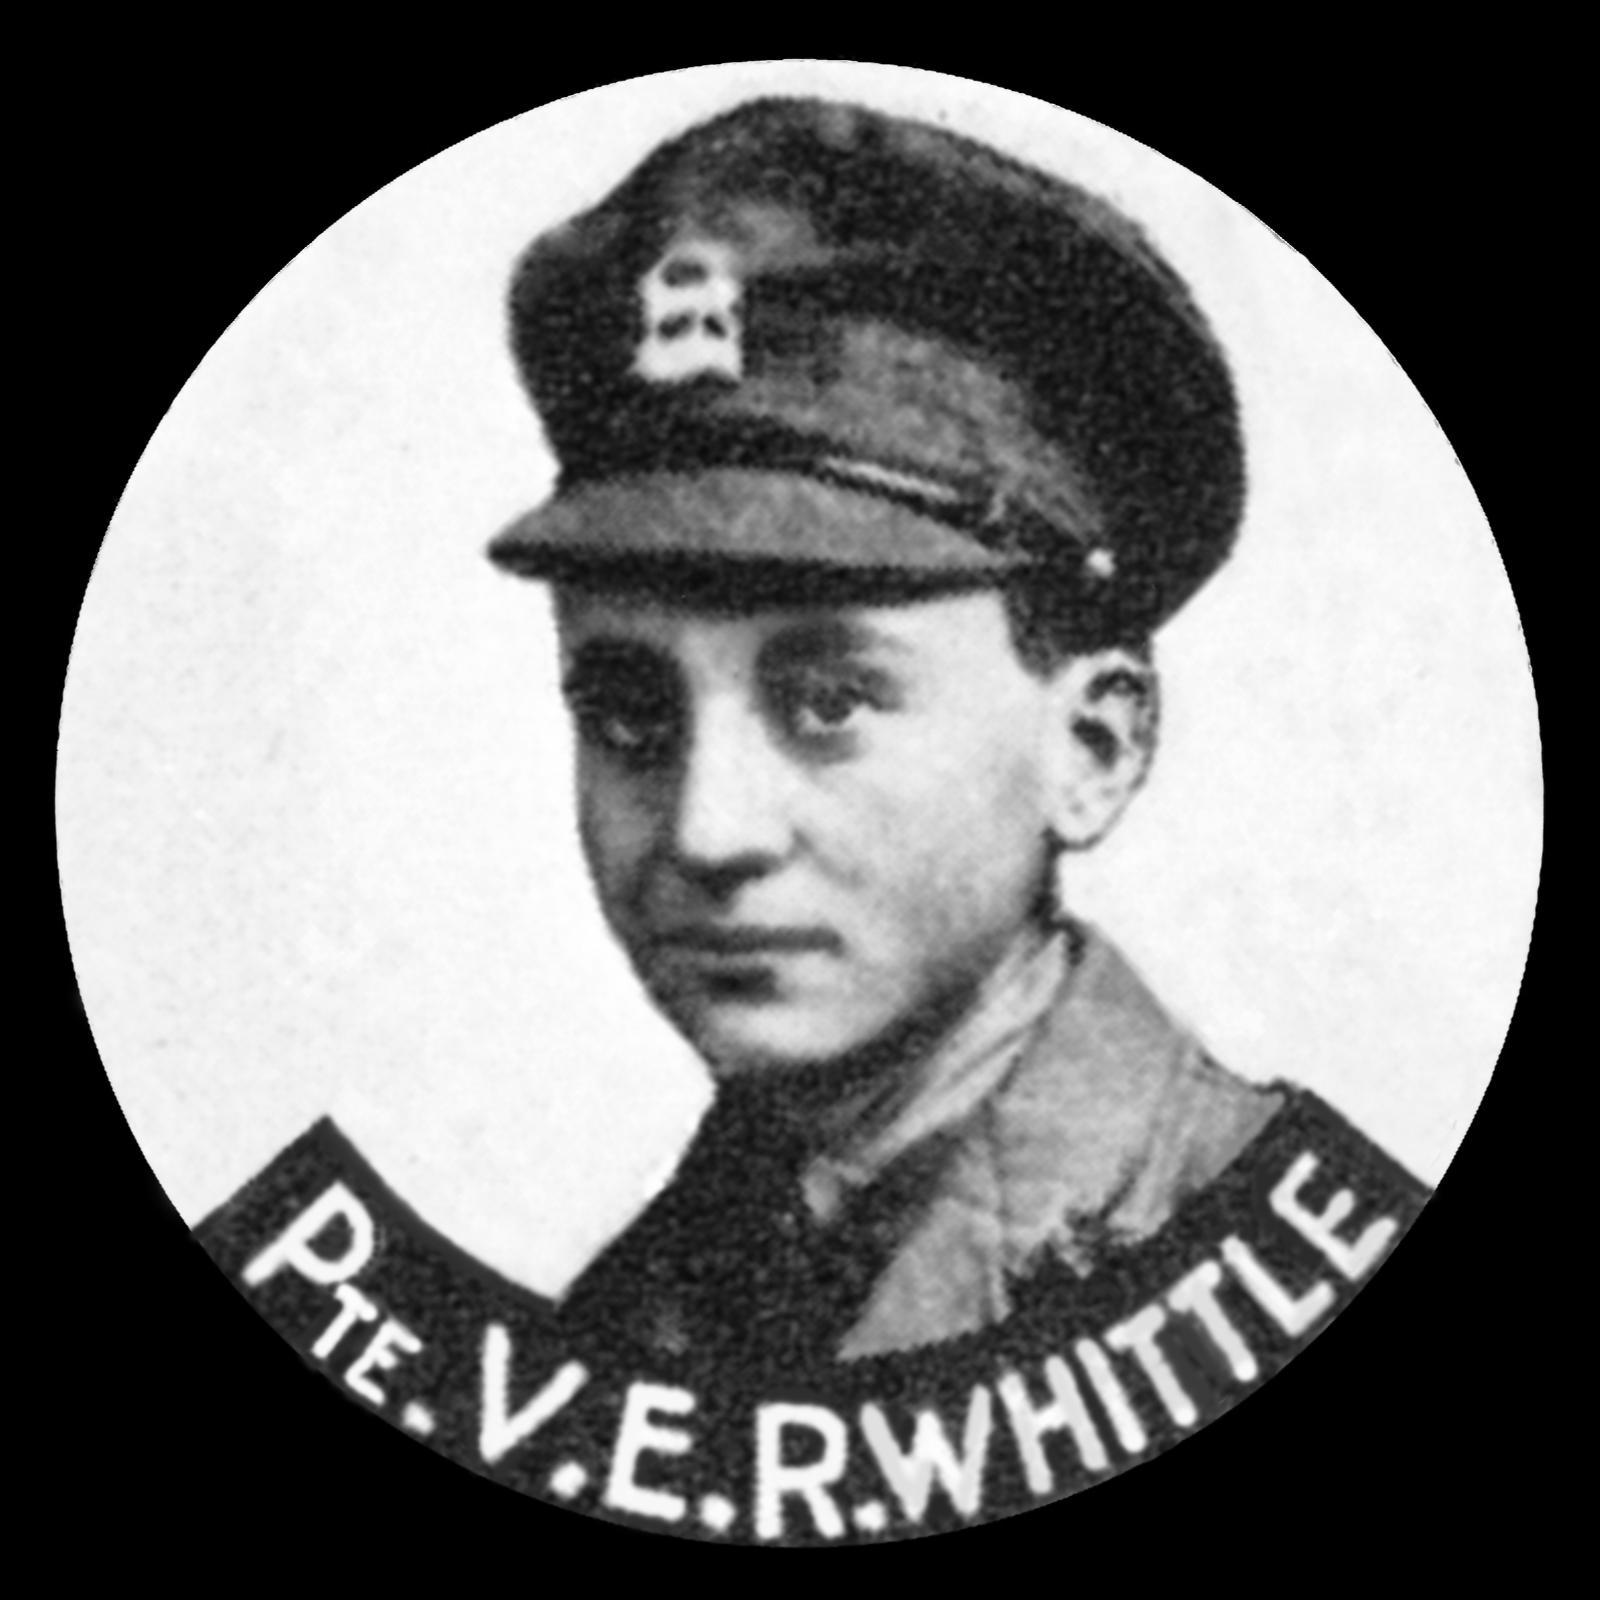 WHITTLE Vere Edward Roberts